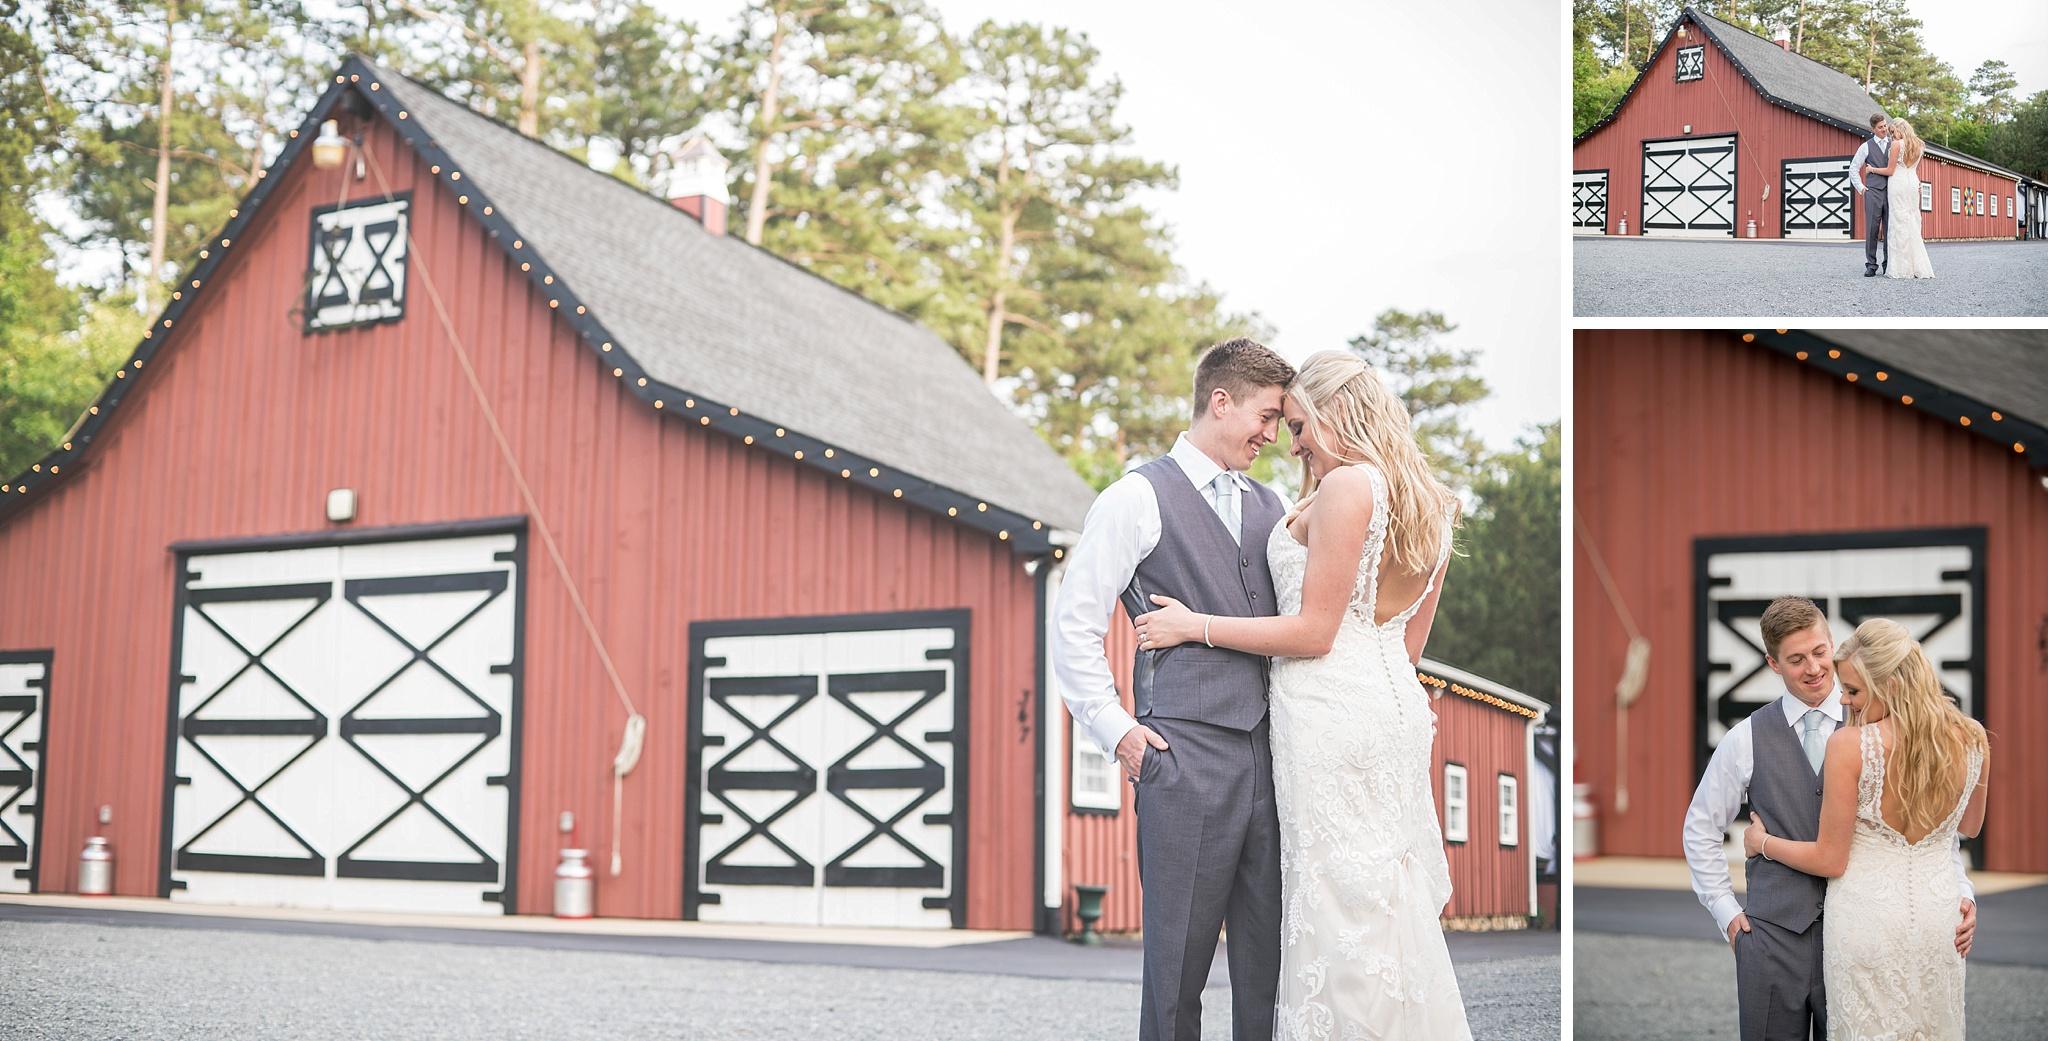 Shady-Wagon-Farm-NC-Wedding-Photographer-0190.jpg